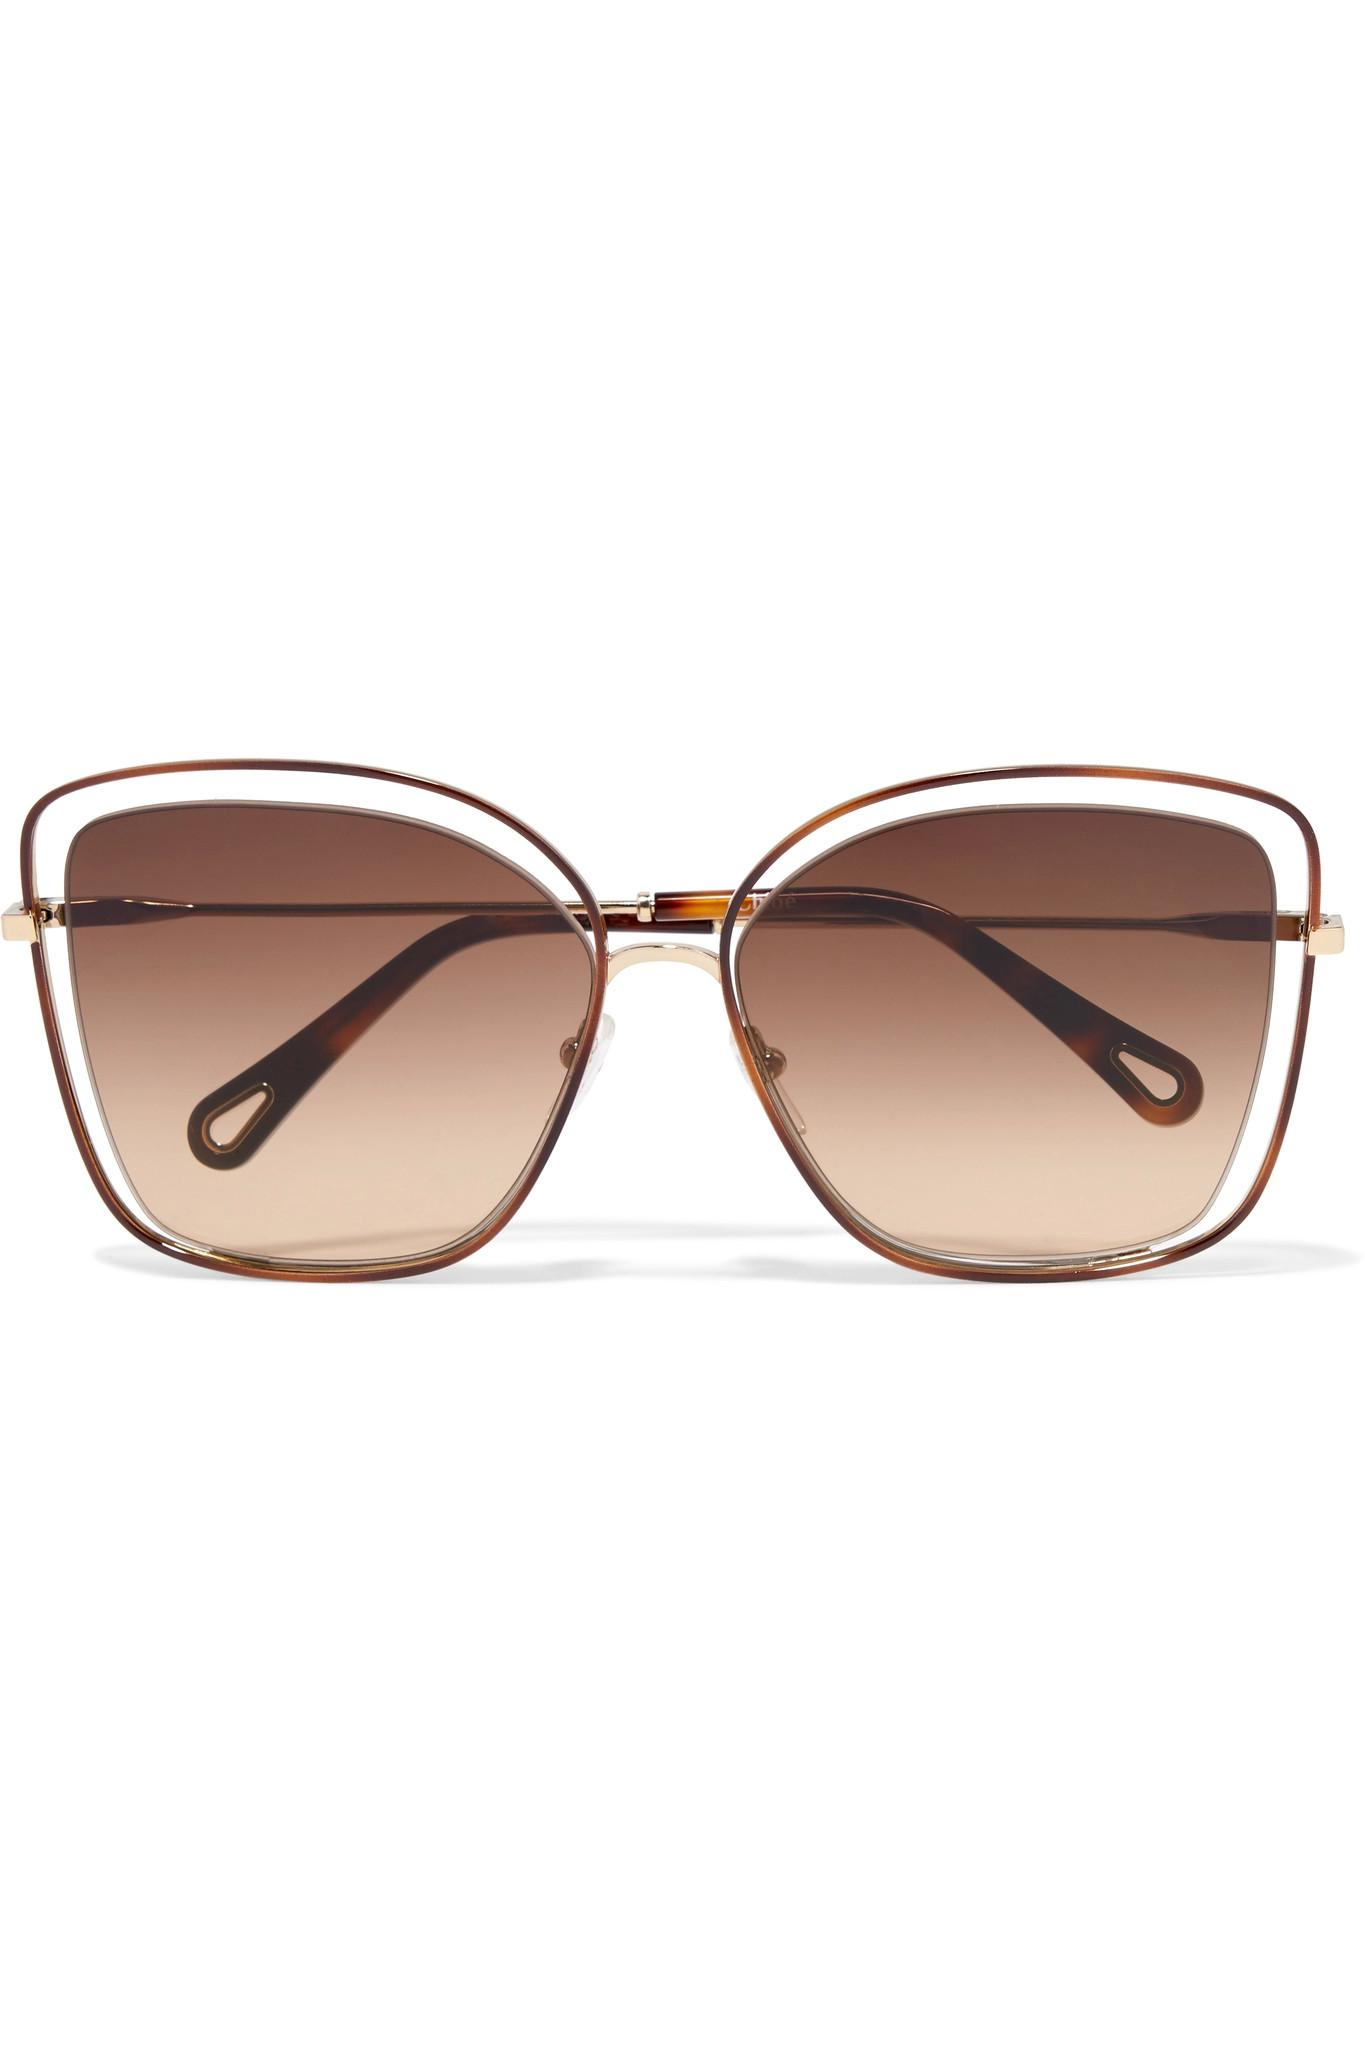 86057219d46 Chloé Poppy Sunglasses in Brown - Lyst